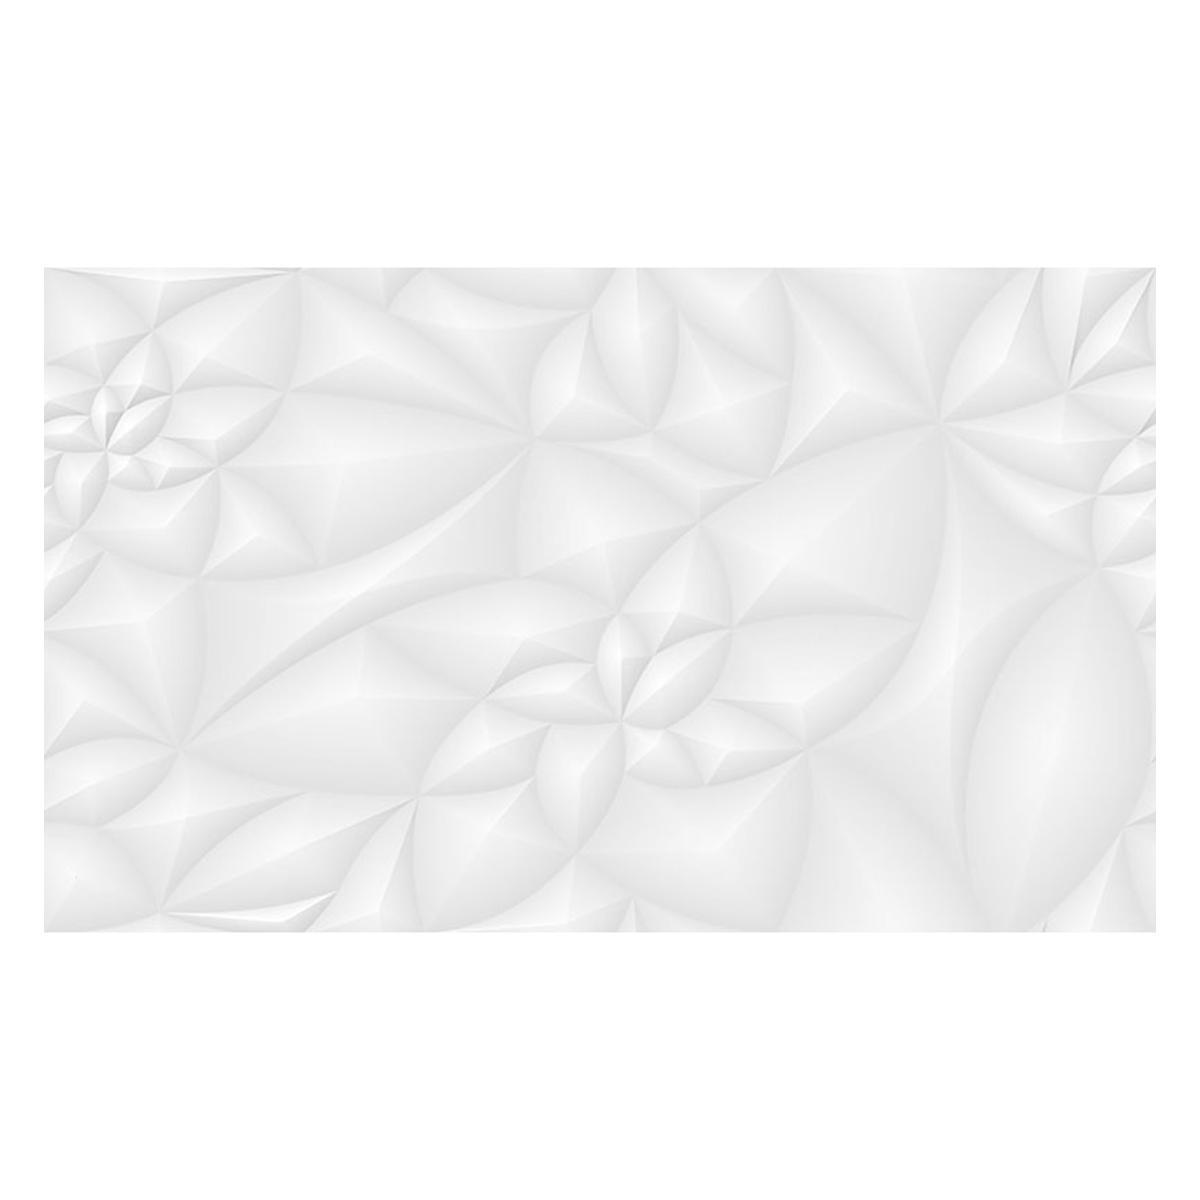 Mayólica Passion Blanco Brillante - 27X45 cm - 1.70 m2